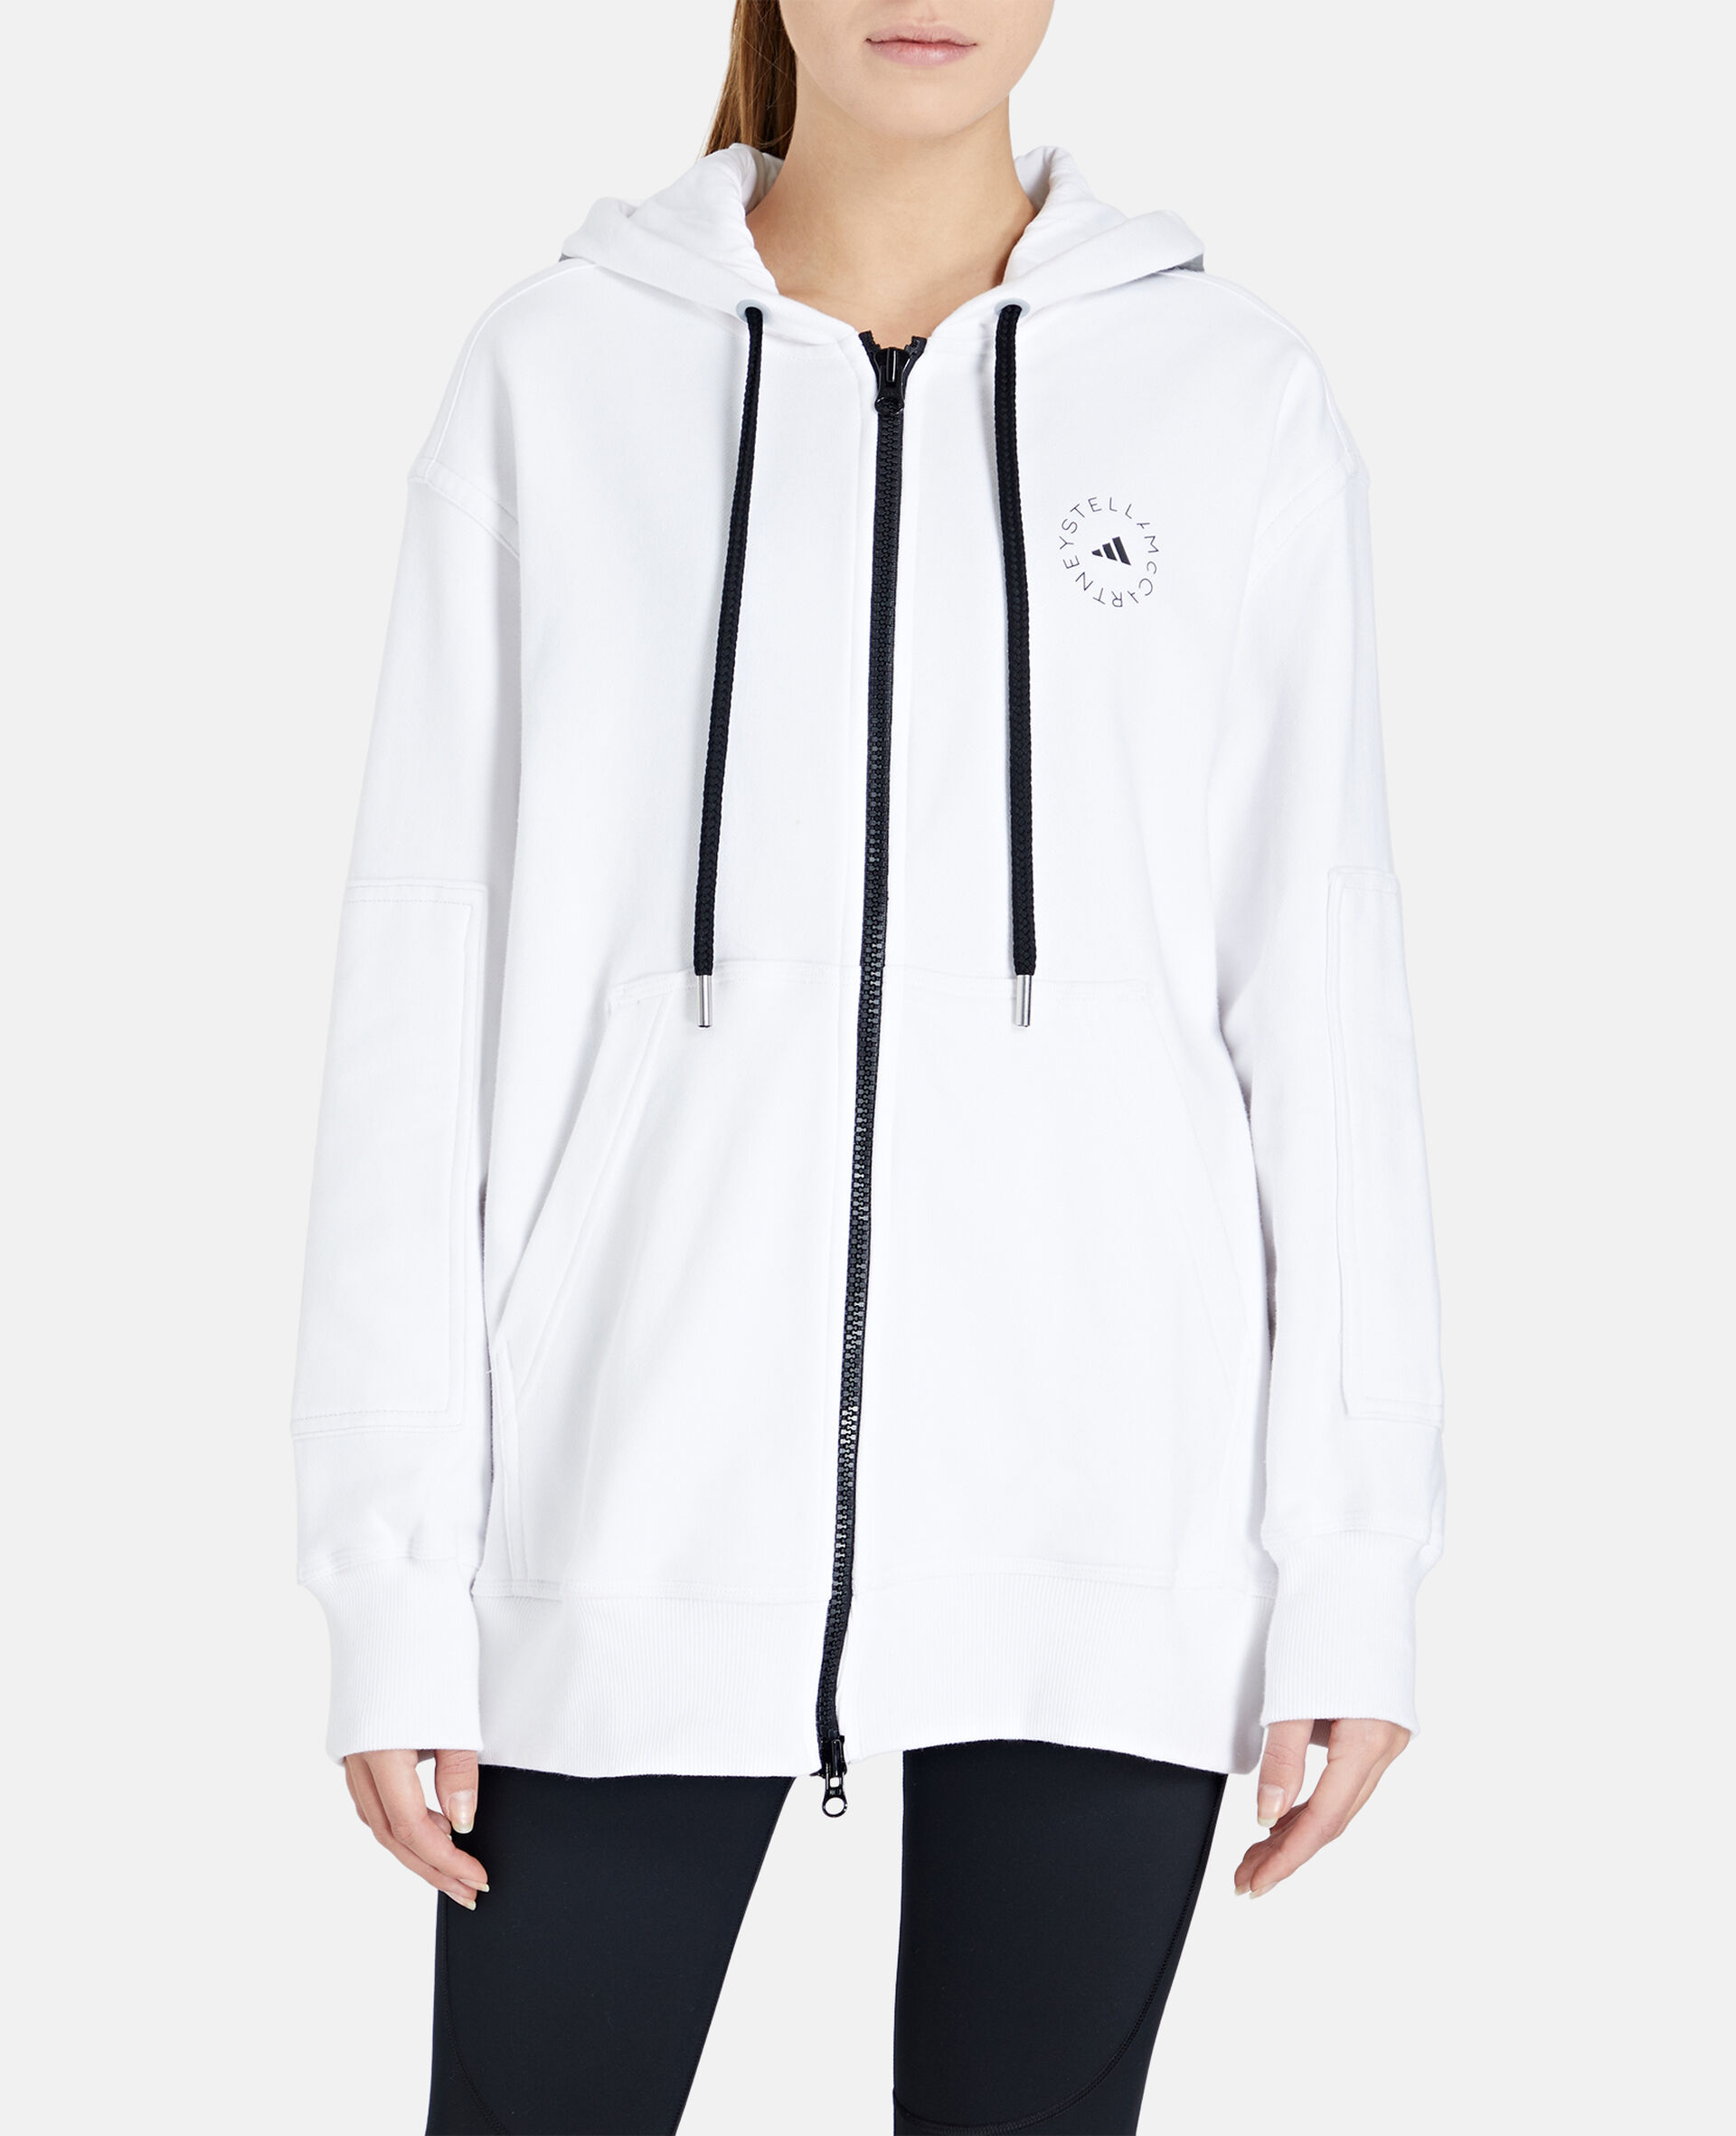 White Full-zipper Hoodie-White-large image number 4